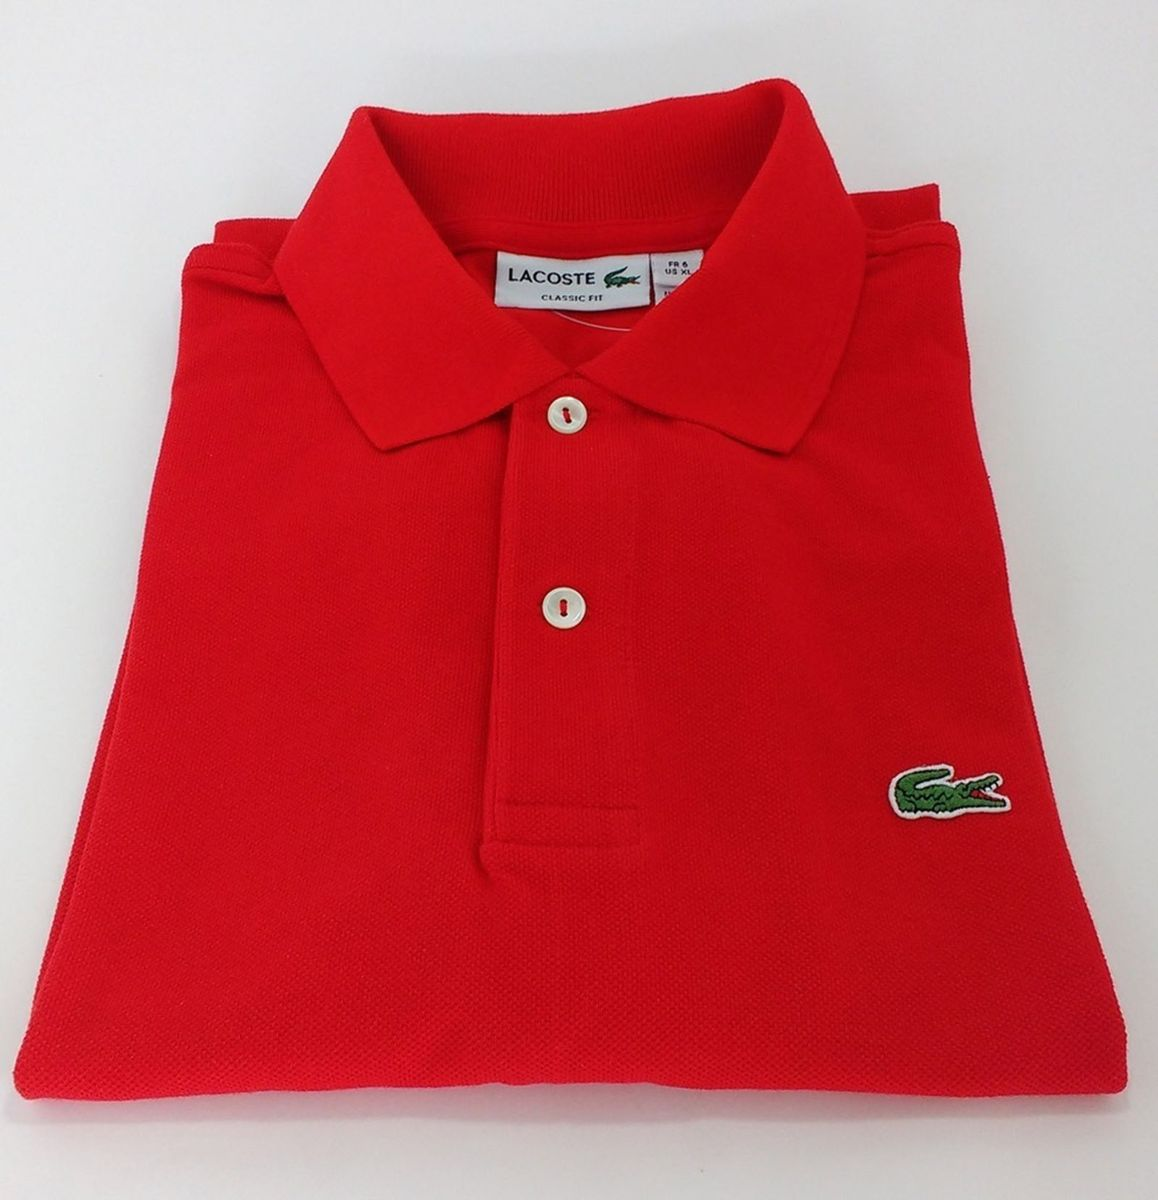 camisa polo lacoste tamanho p - camisas lacoste